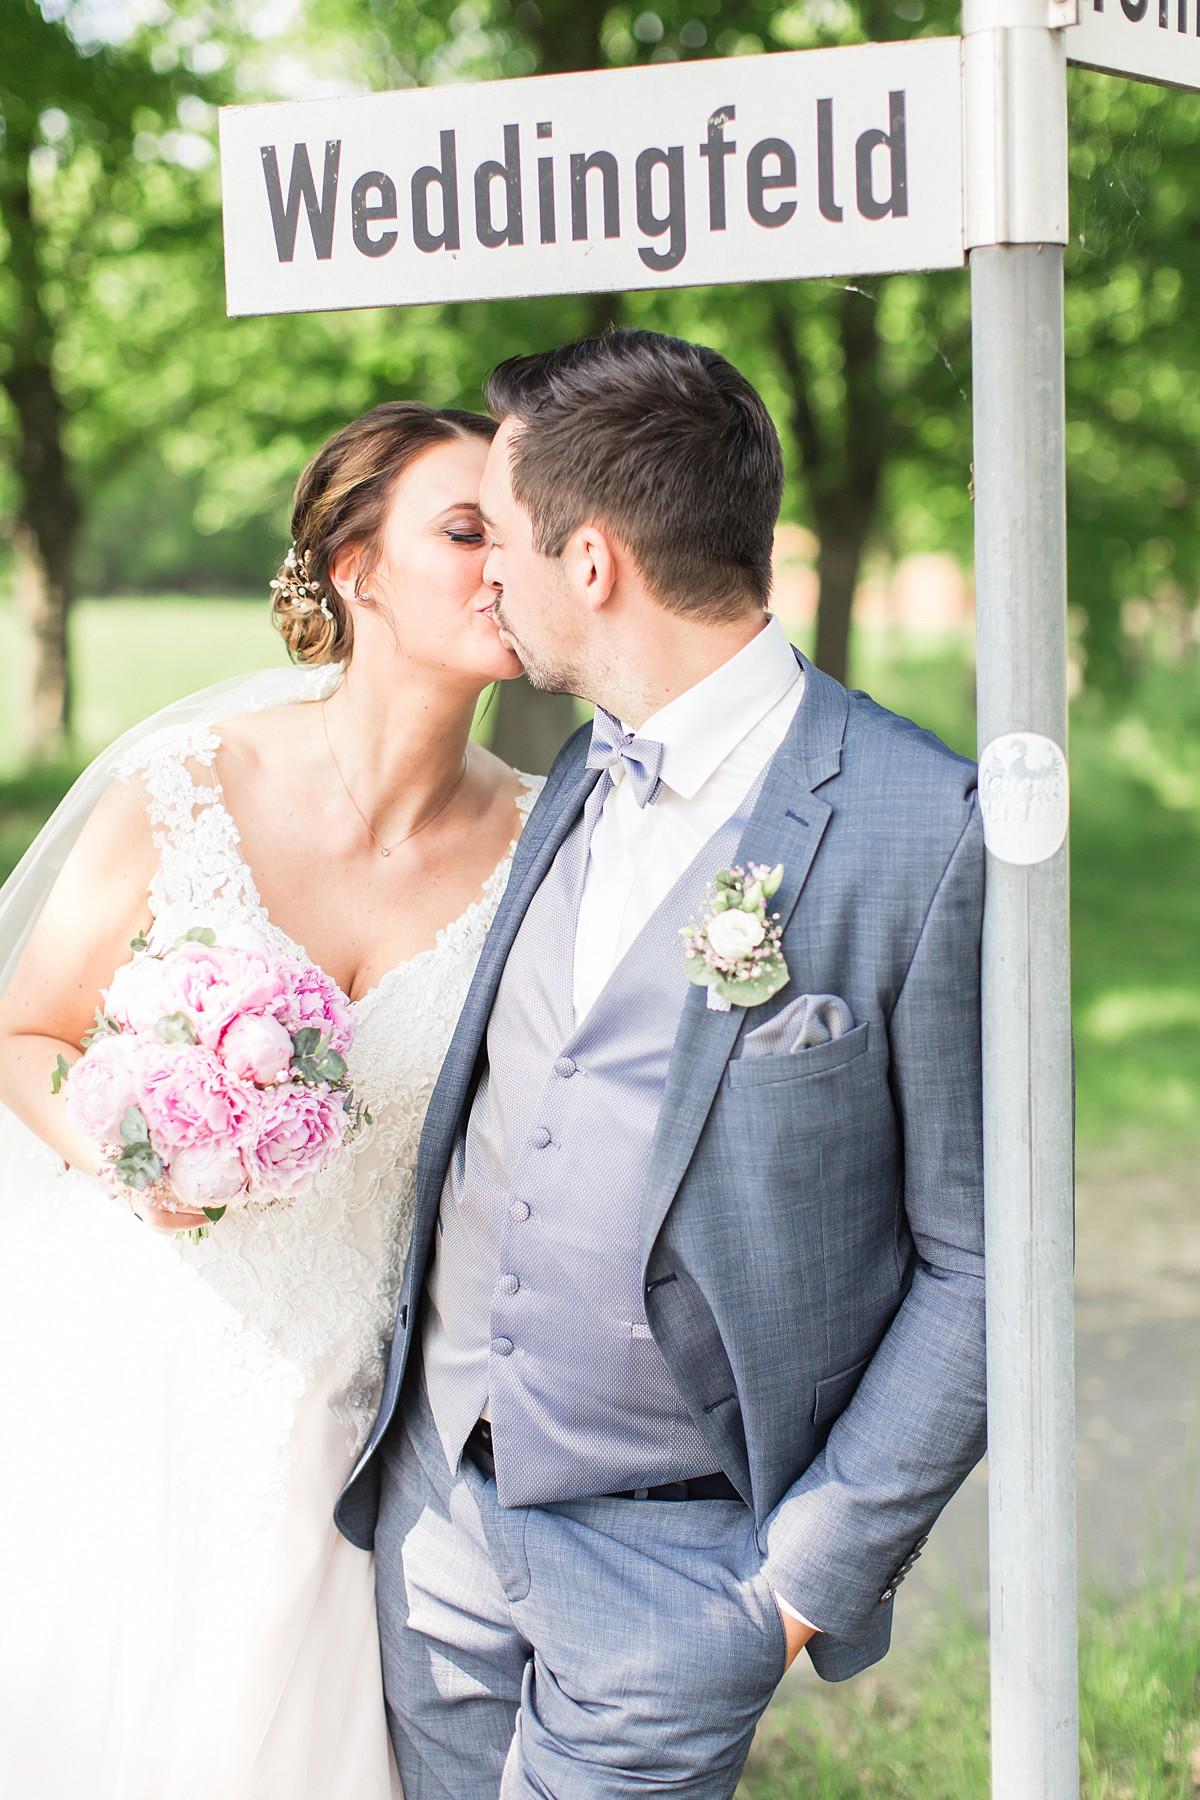 Hochzeitsfotograf-Wedding-Lübbecke-Espelkamp-Marco-Huether-Fotograf_0047